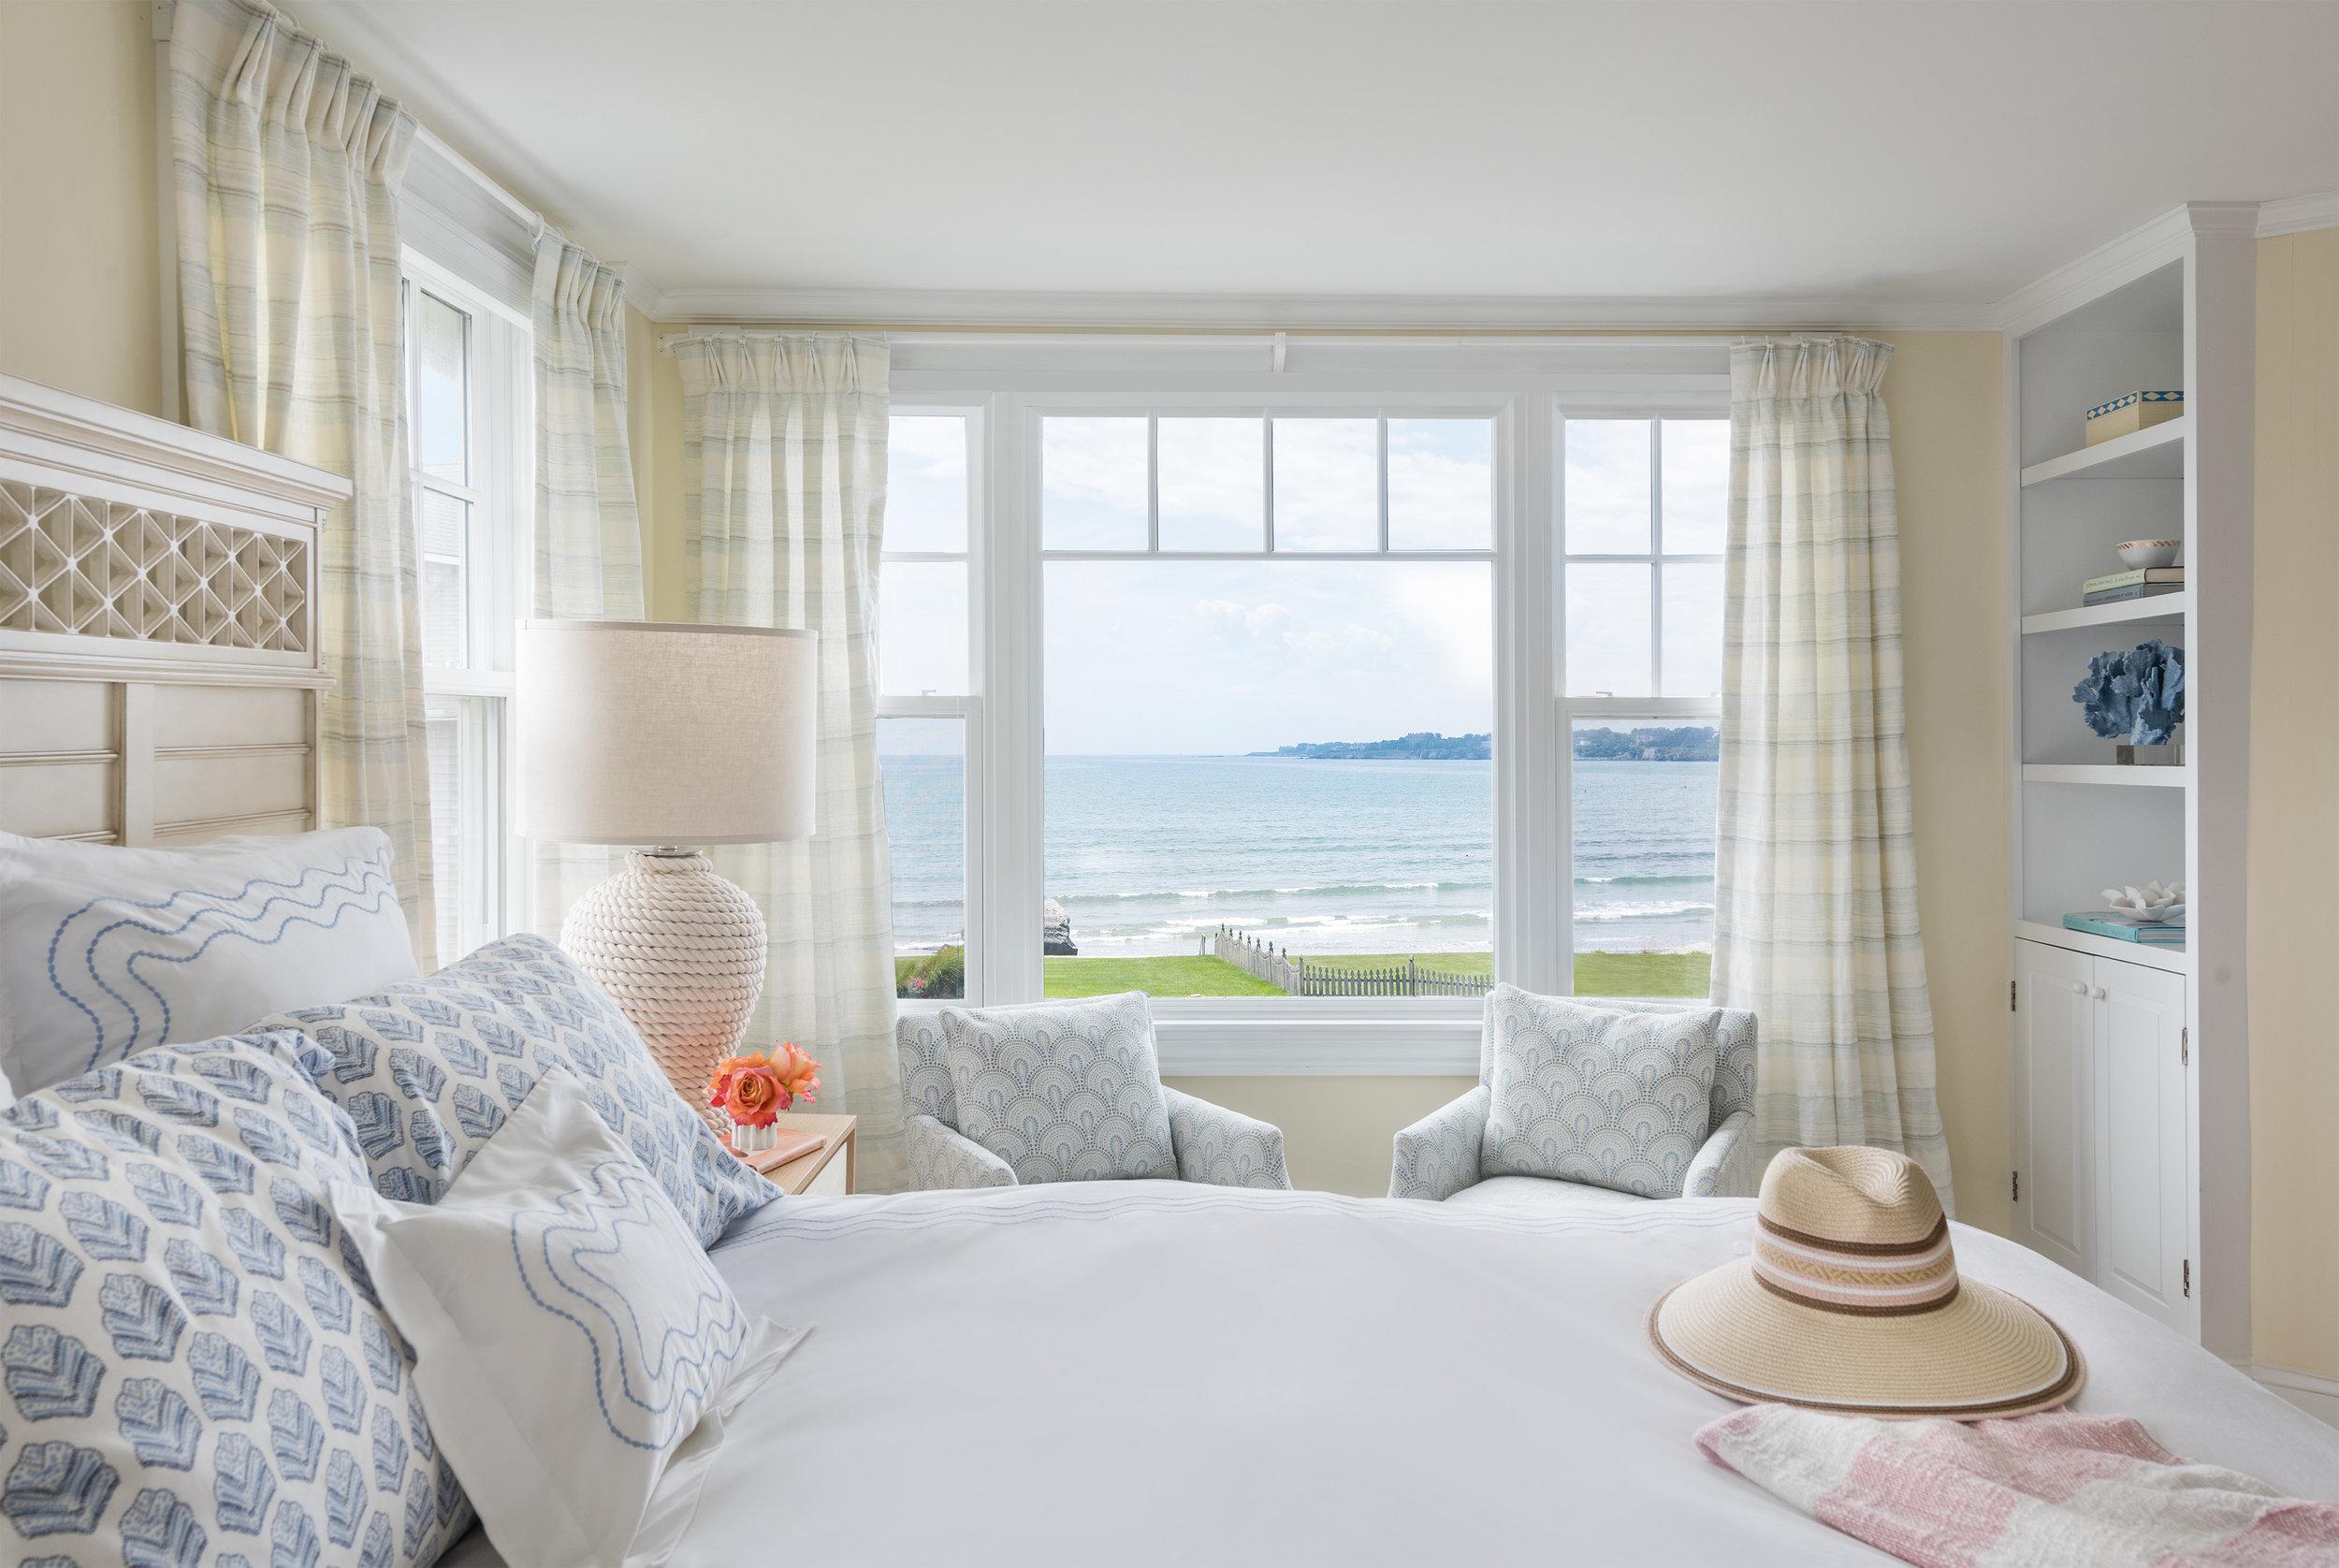 interior design, Rhode Island, Newport, ocean view, bedroom, beach style, beach design